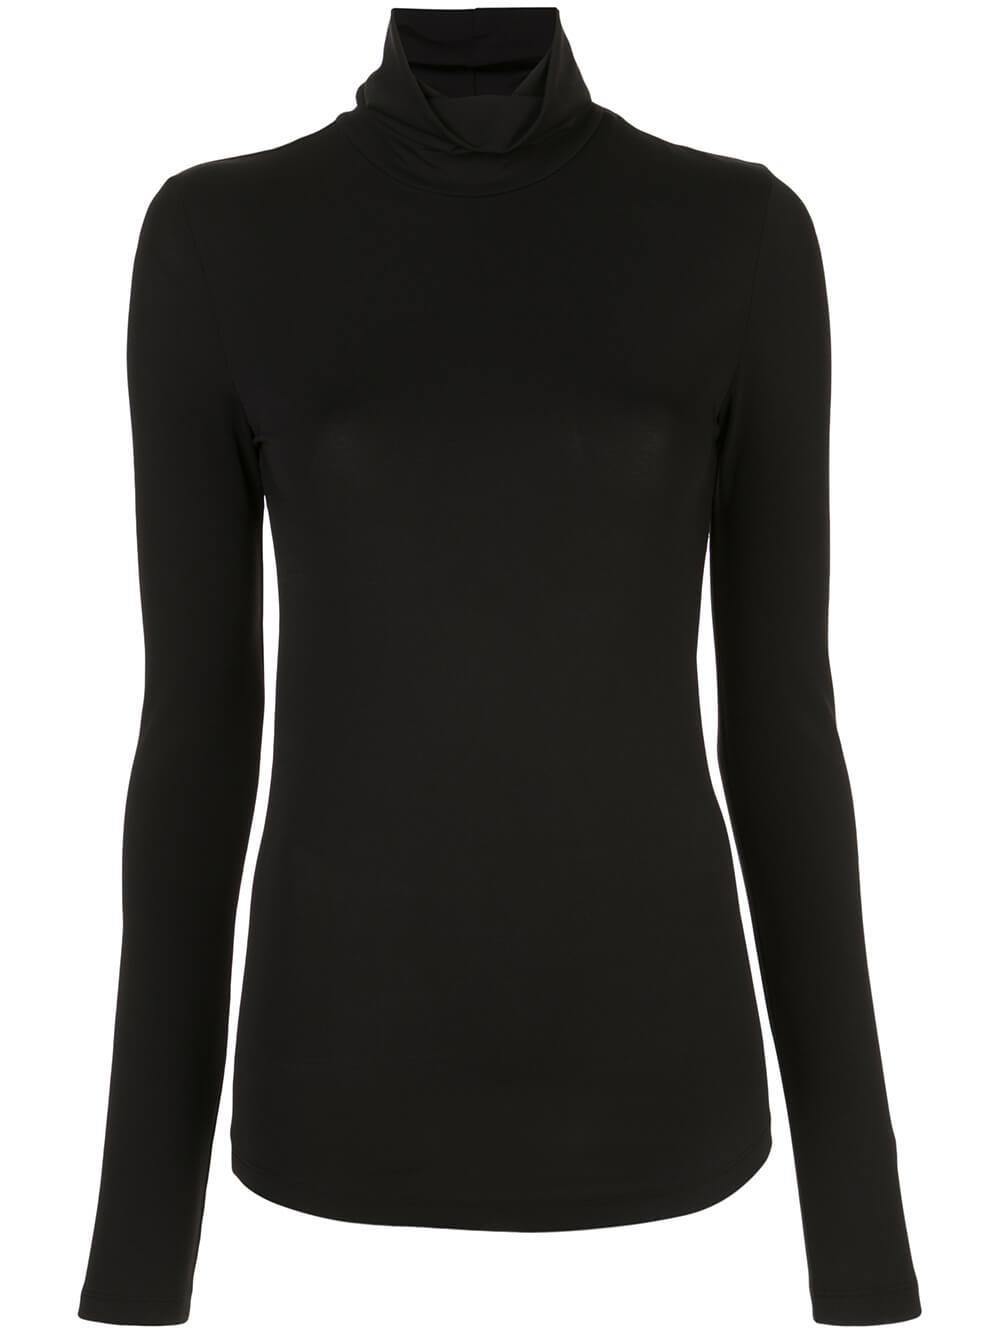 Long Sleeve Solid Jersy T- Neck Top Item # JOYELA-R20